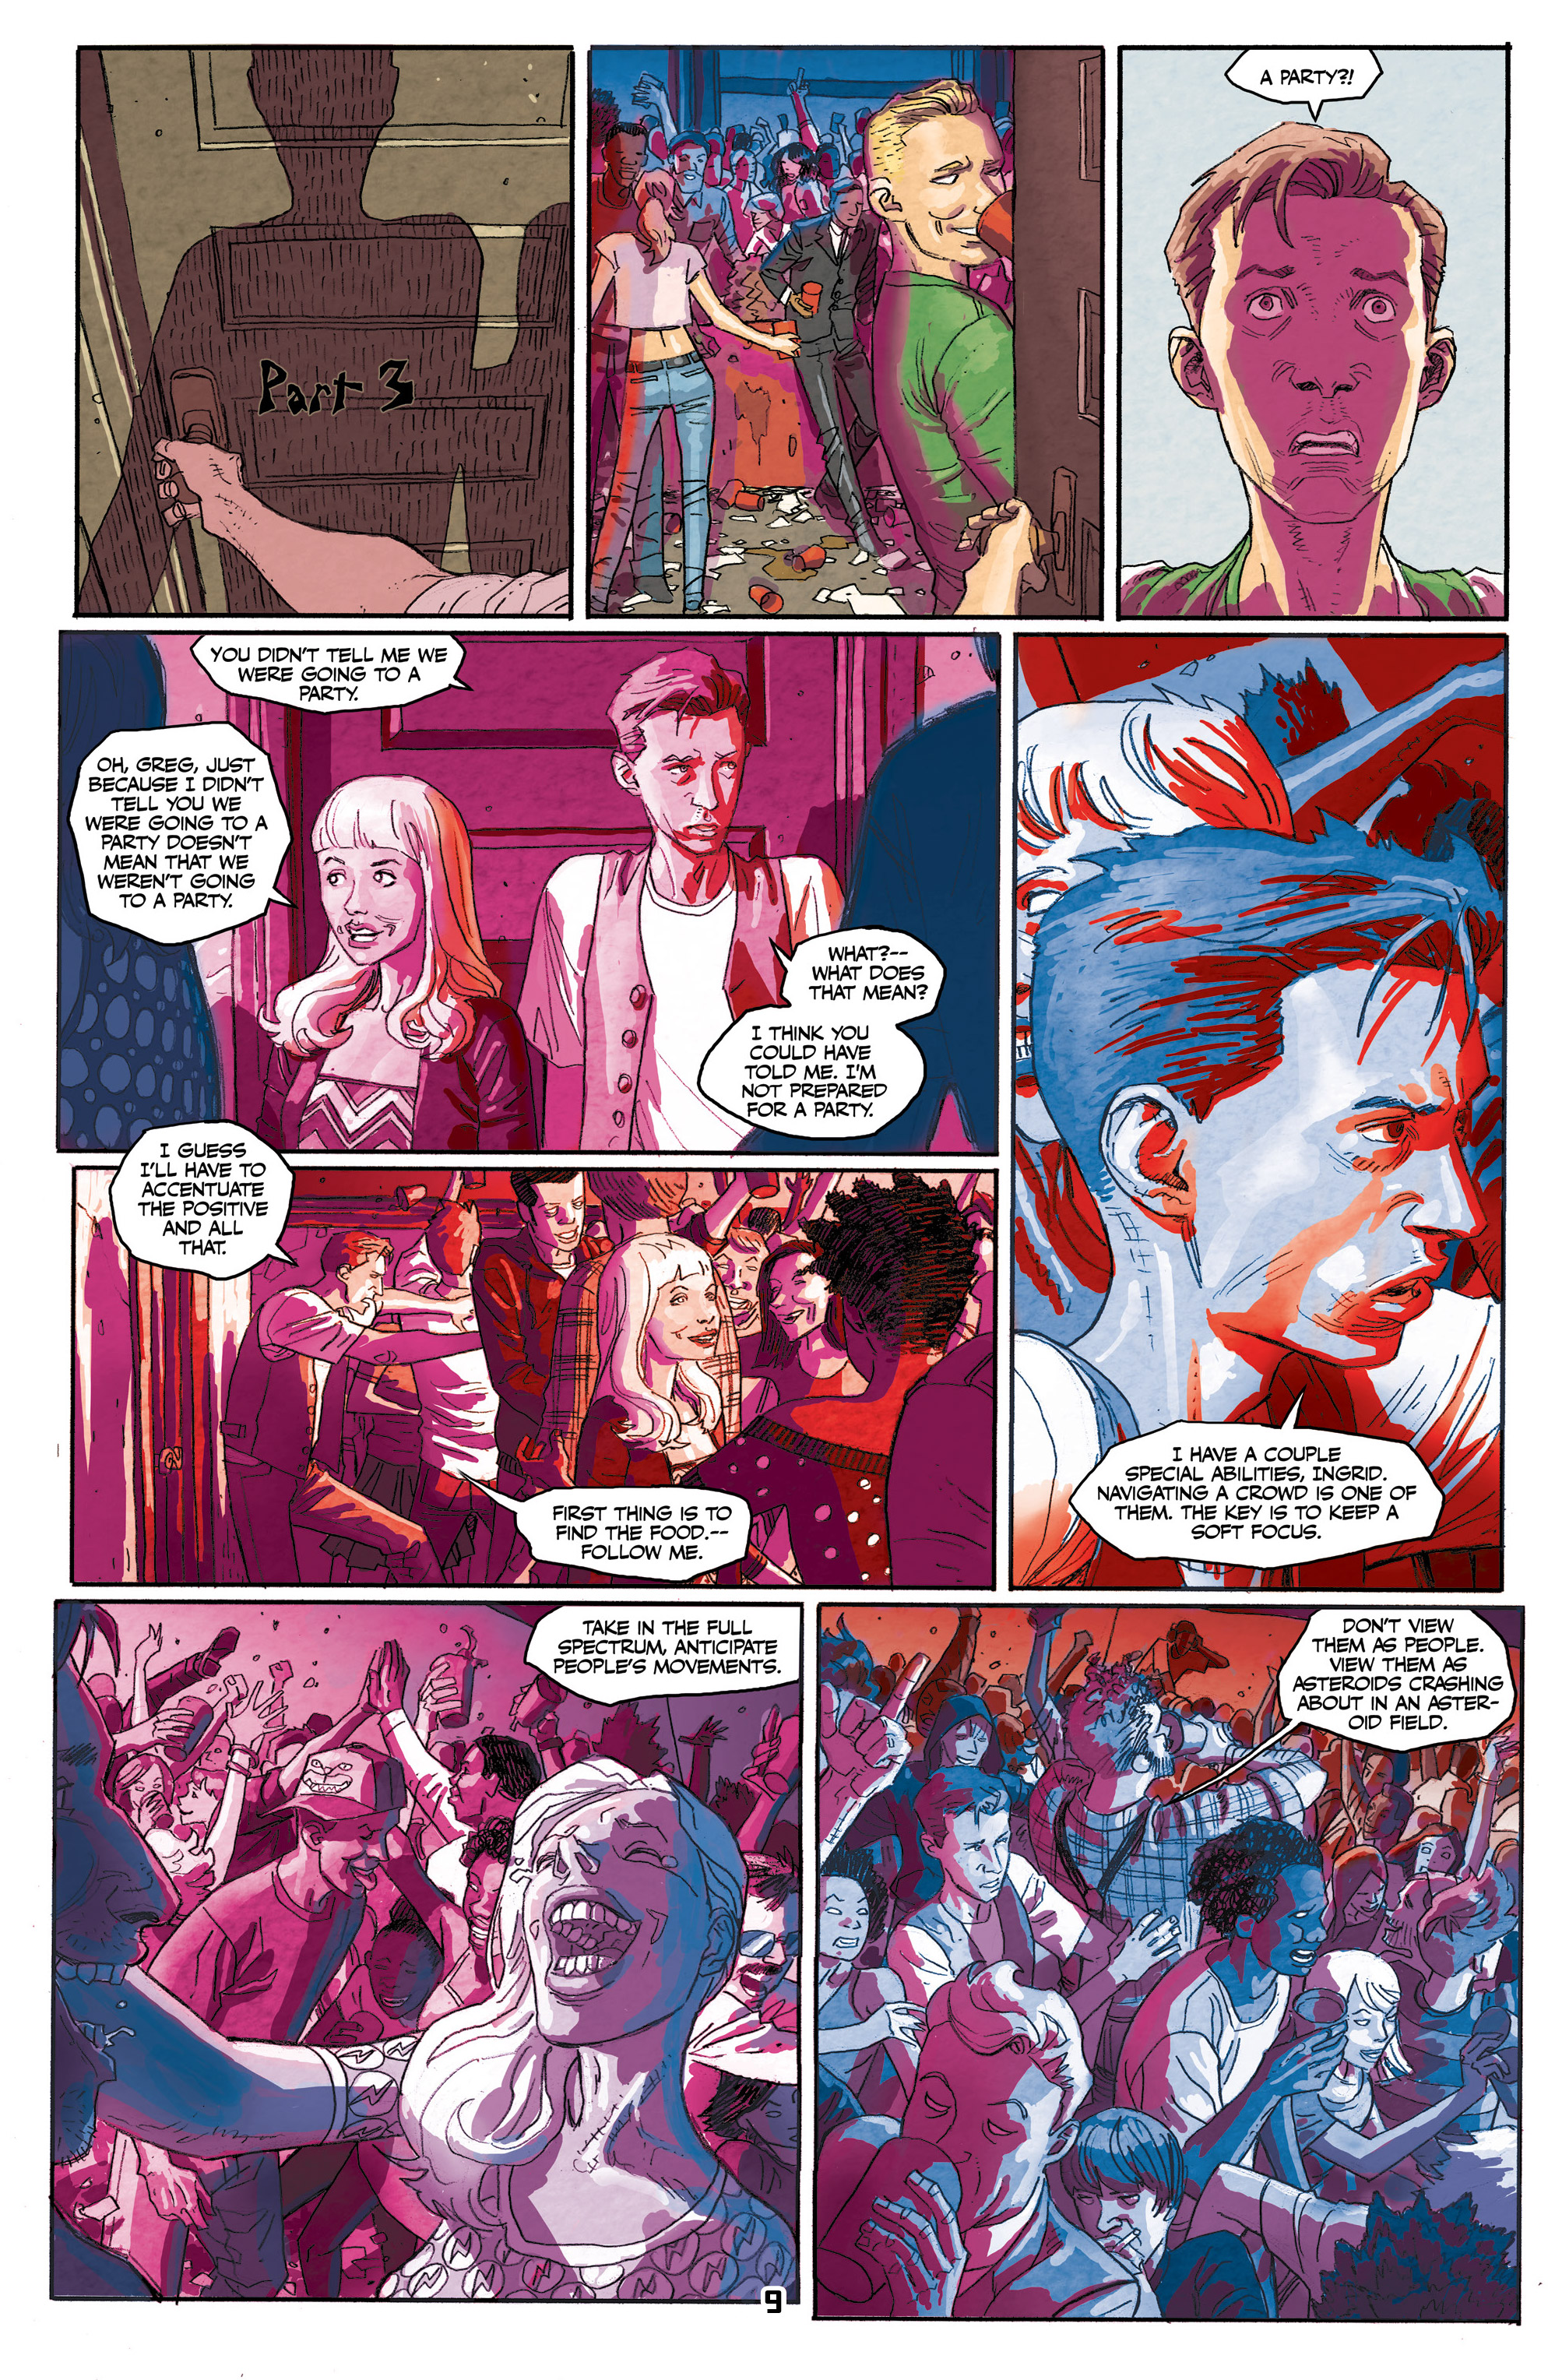 Read online Paklis comic -  Issue #1 - 11